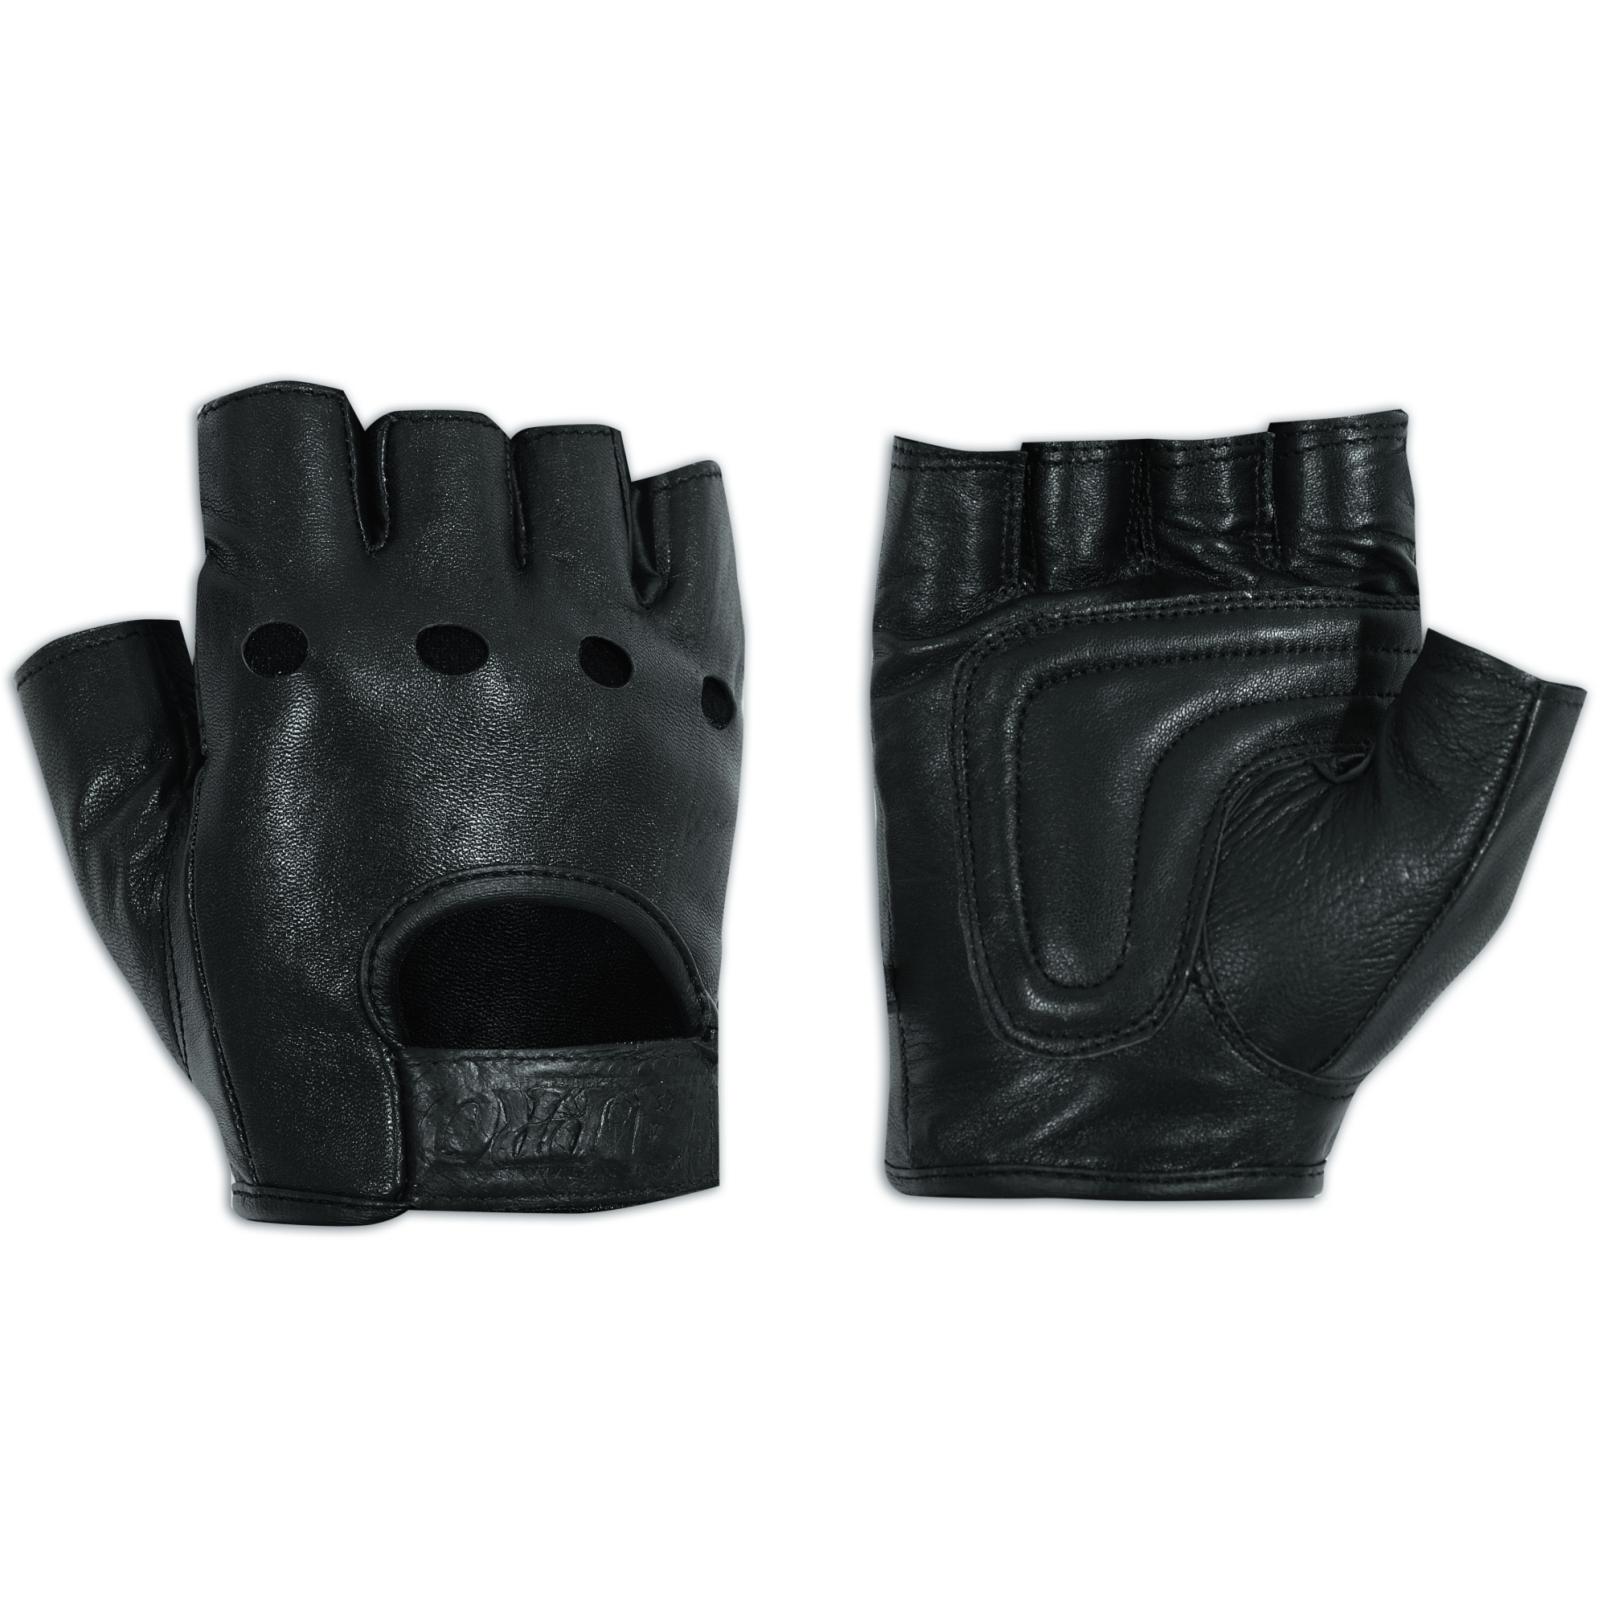 Fingerless Biker Gloves Soft leather Cowhide Motorbike ...